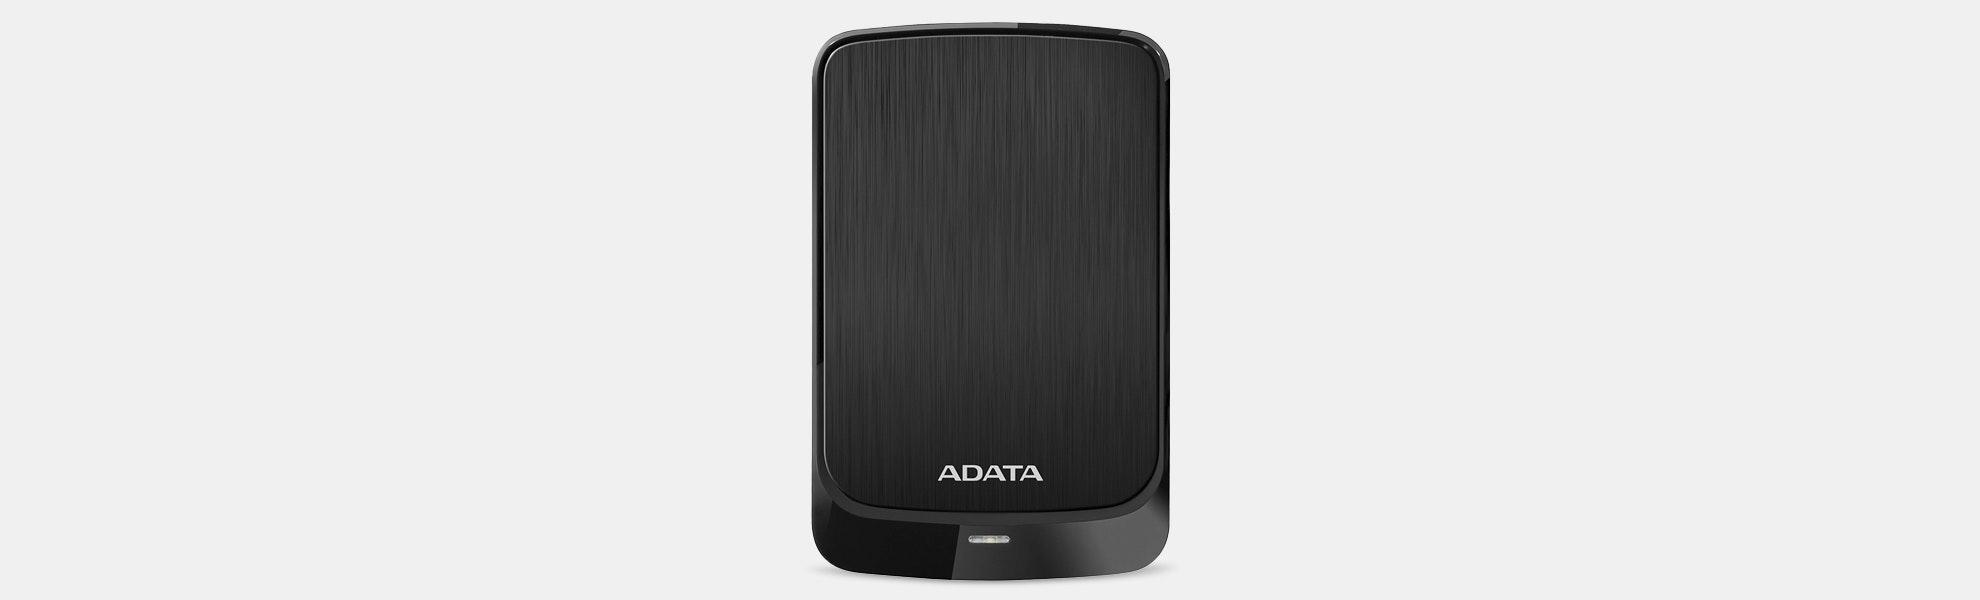 ADATA HV320 Ultra-Slim External HDD Drive